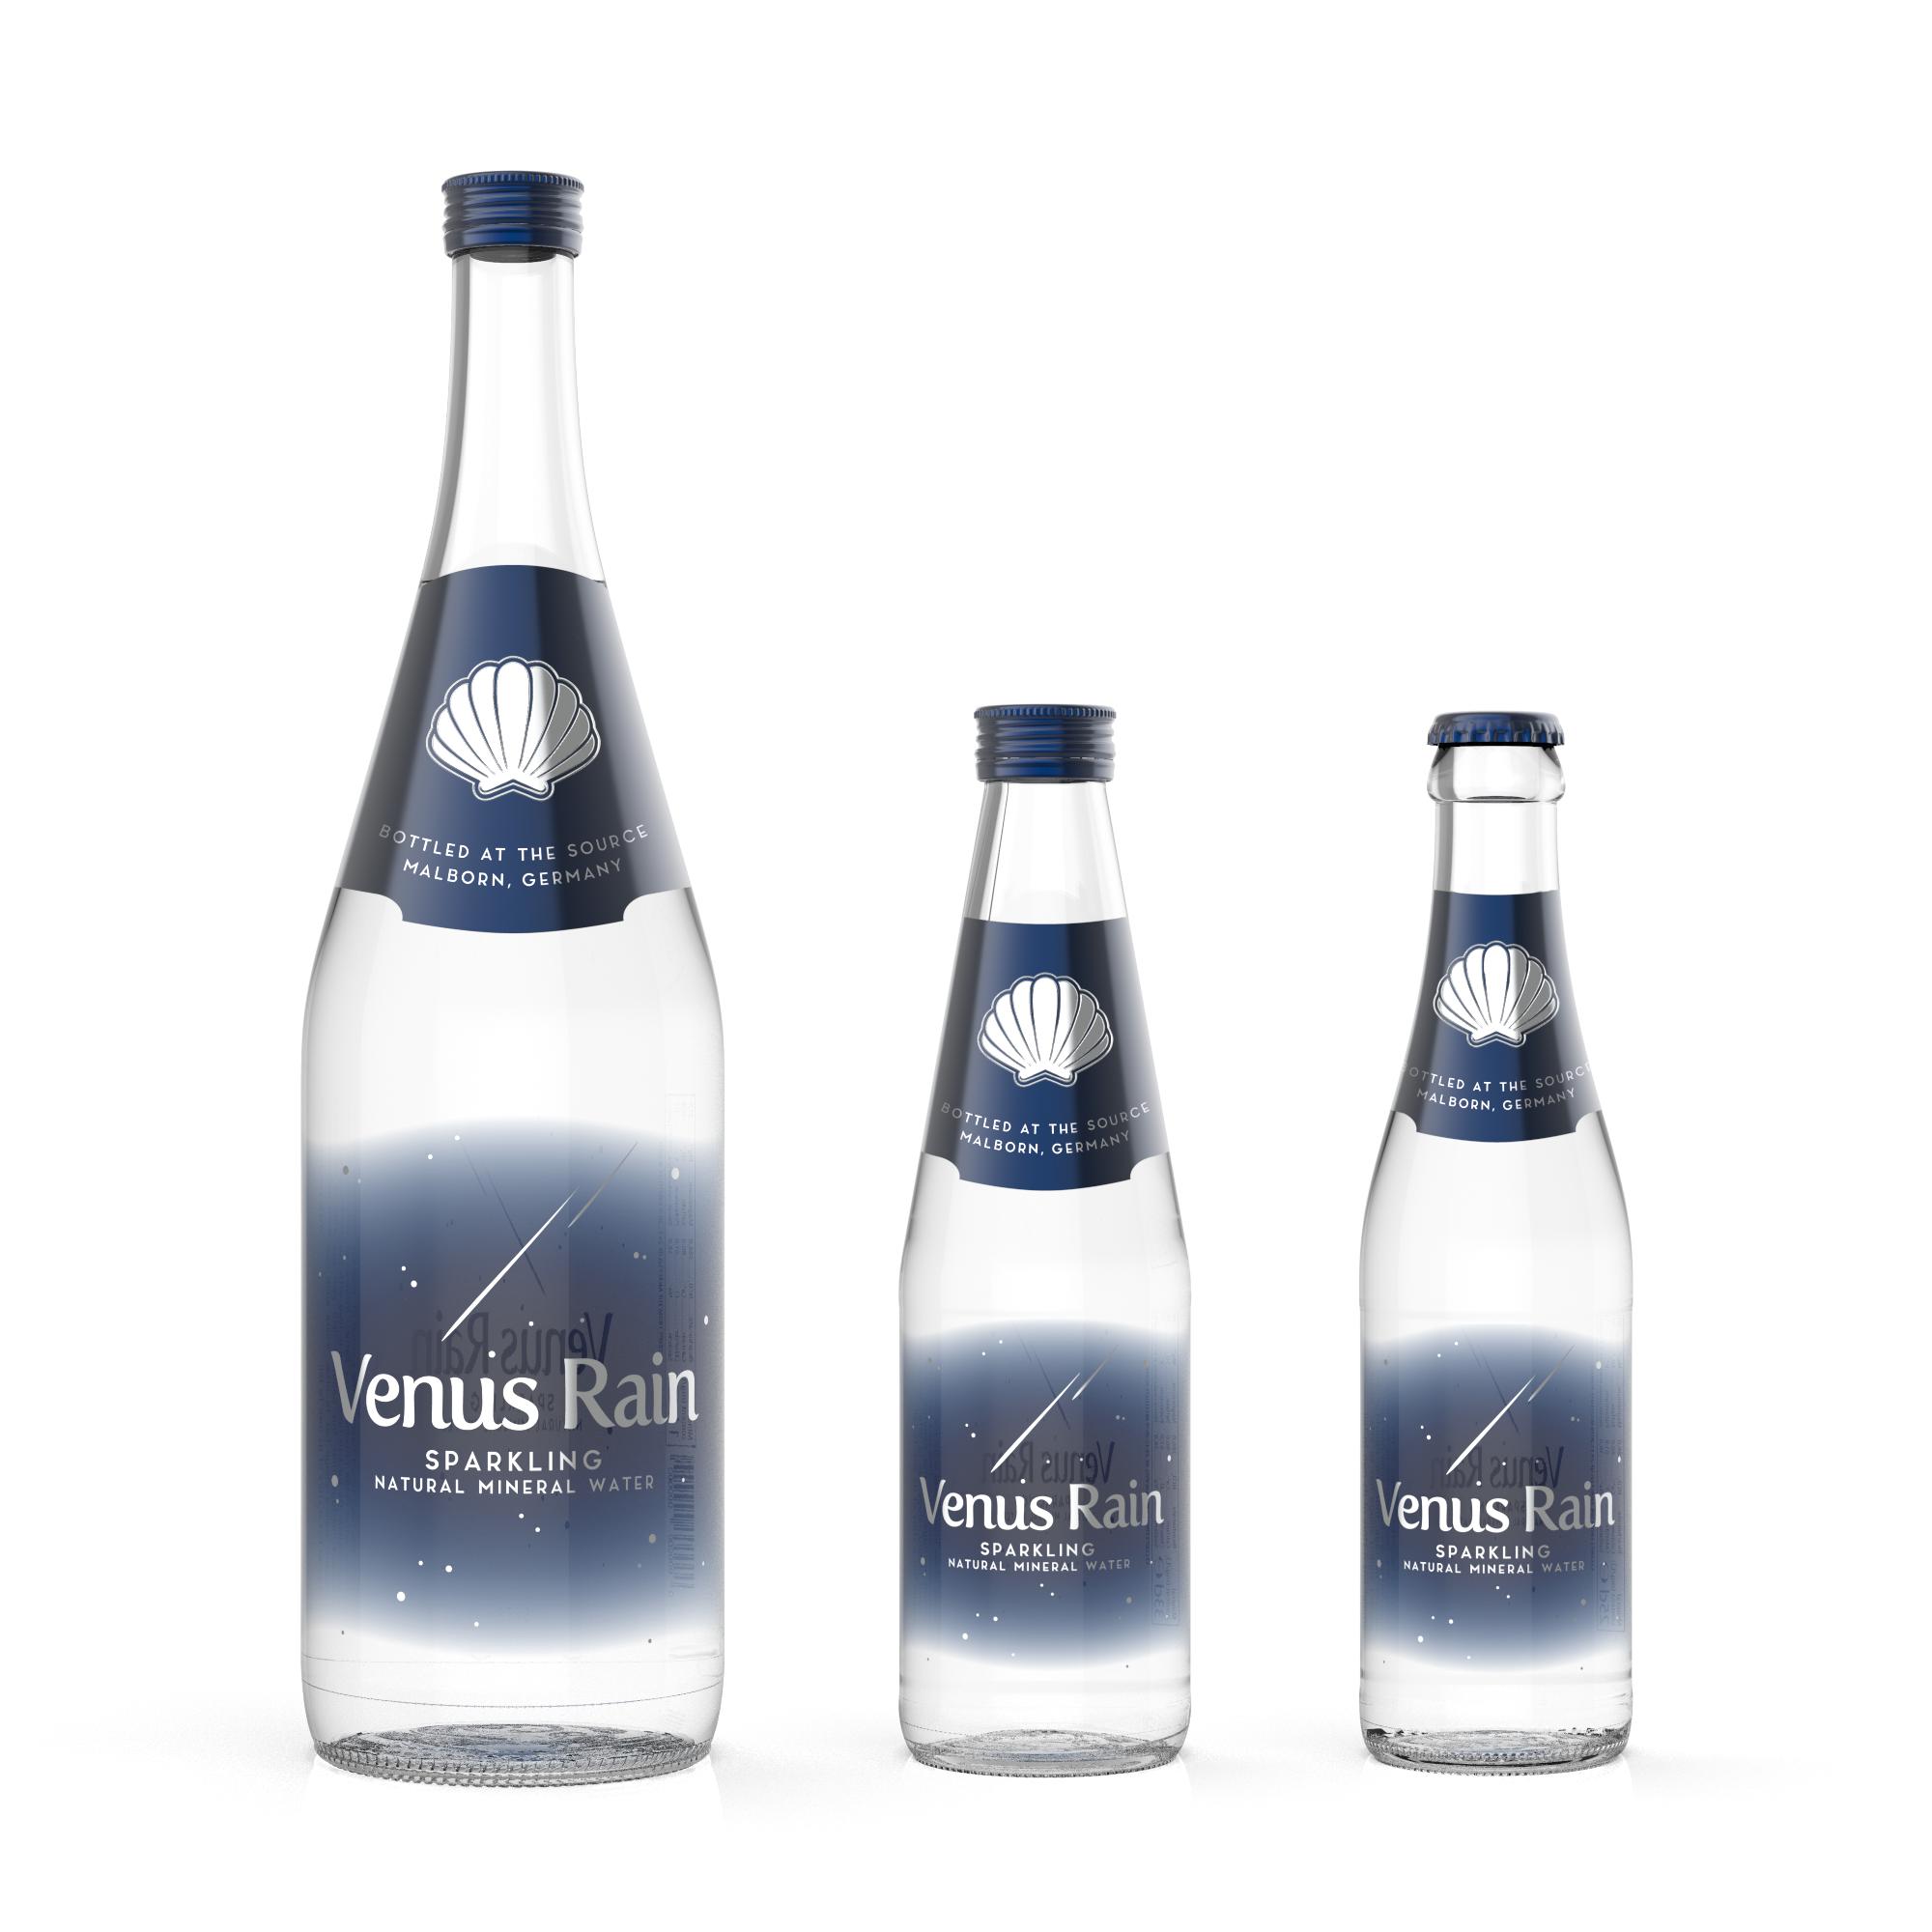 Venus Rain Premium Sparkling Water (Glass Bottles)